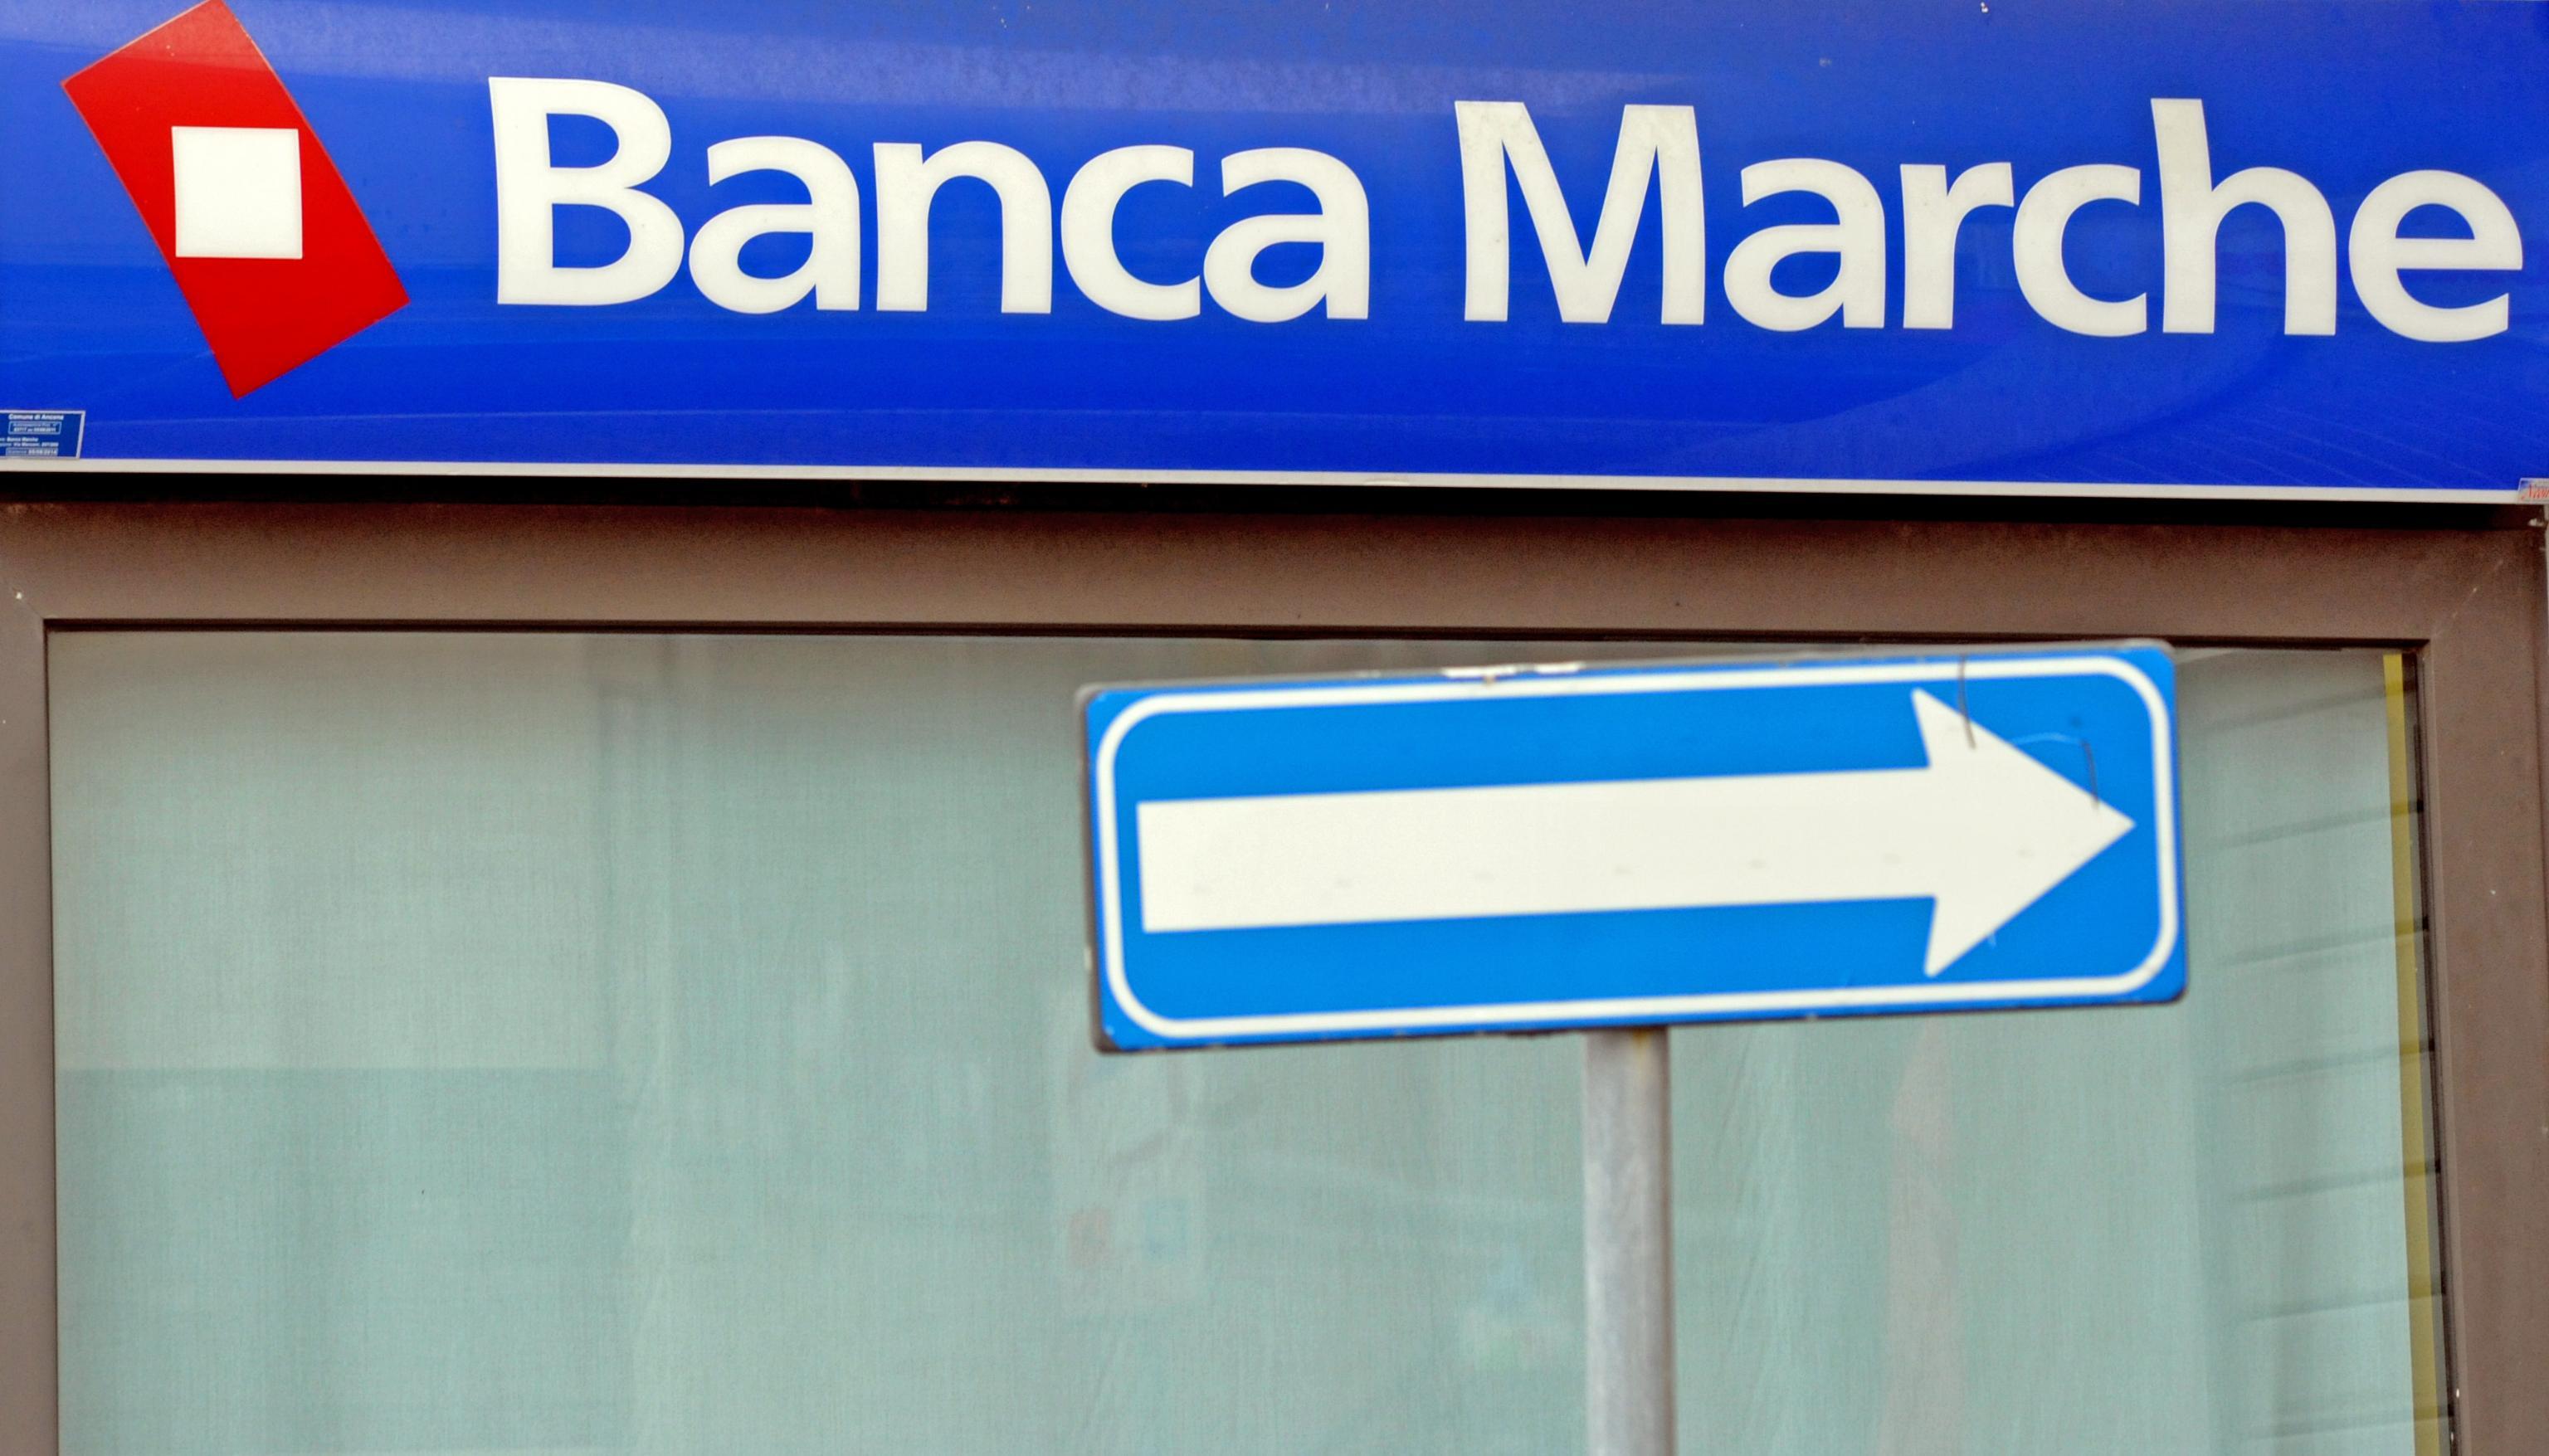 Crac BM, Bankitalia sarà parte civile